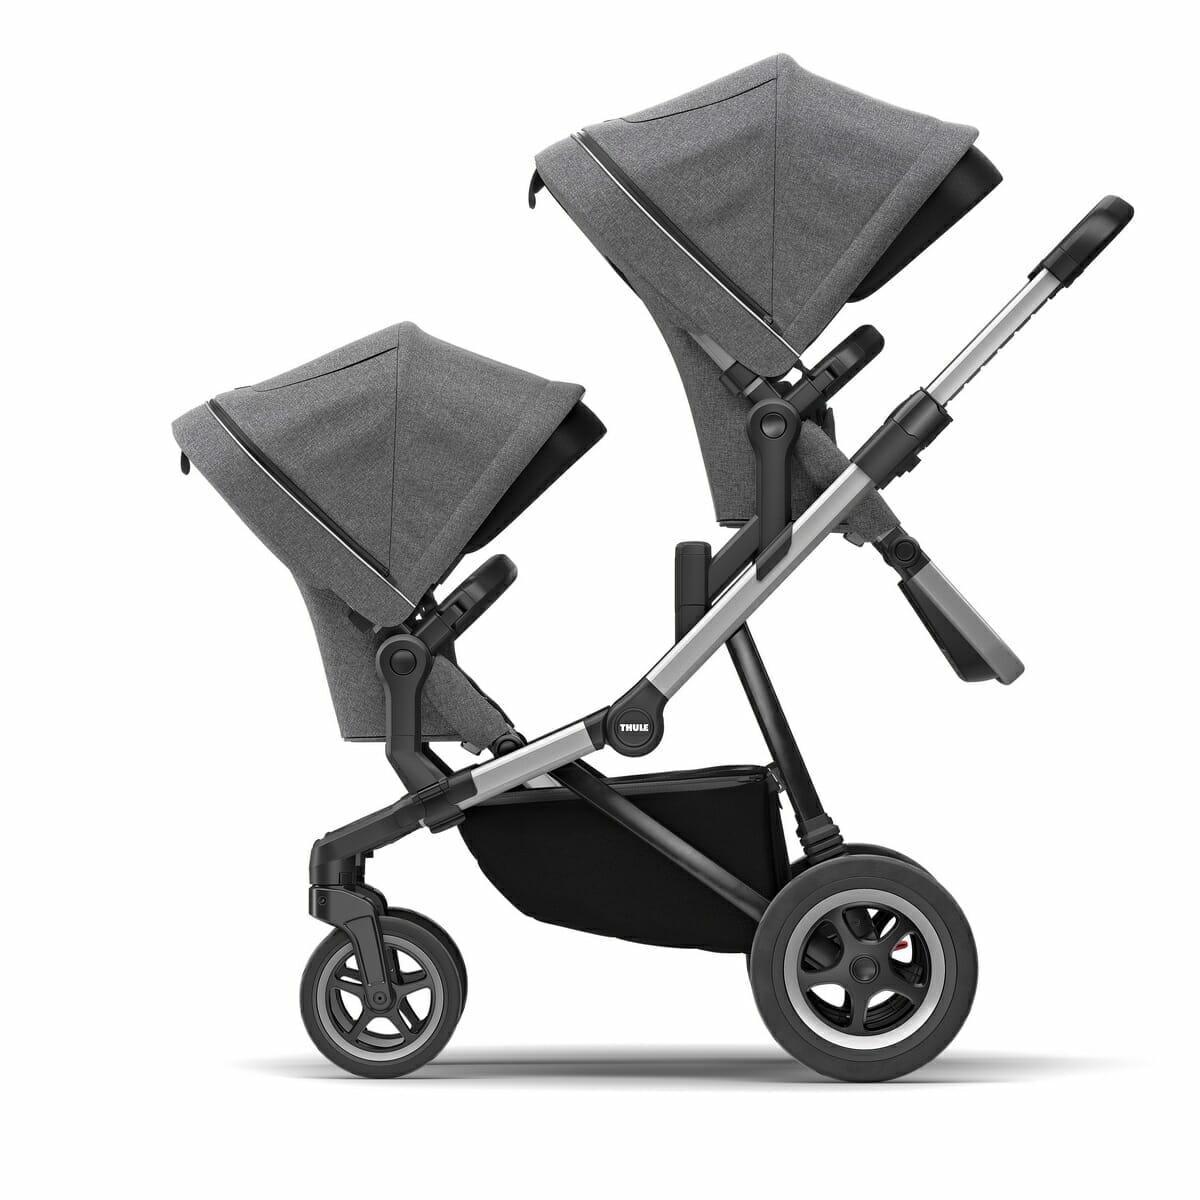 Thule Sleek Iu5 Configduo Sibling Seat Parentfacing Side